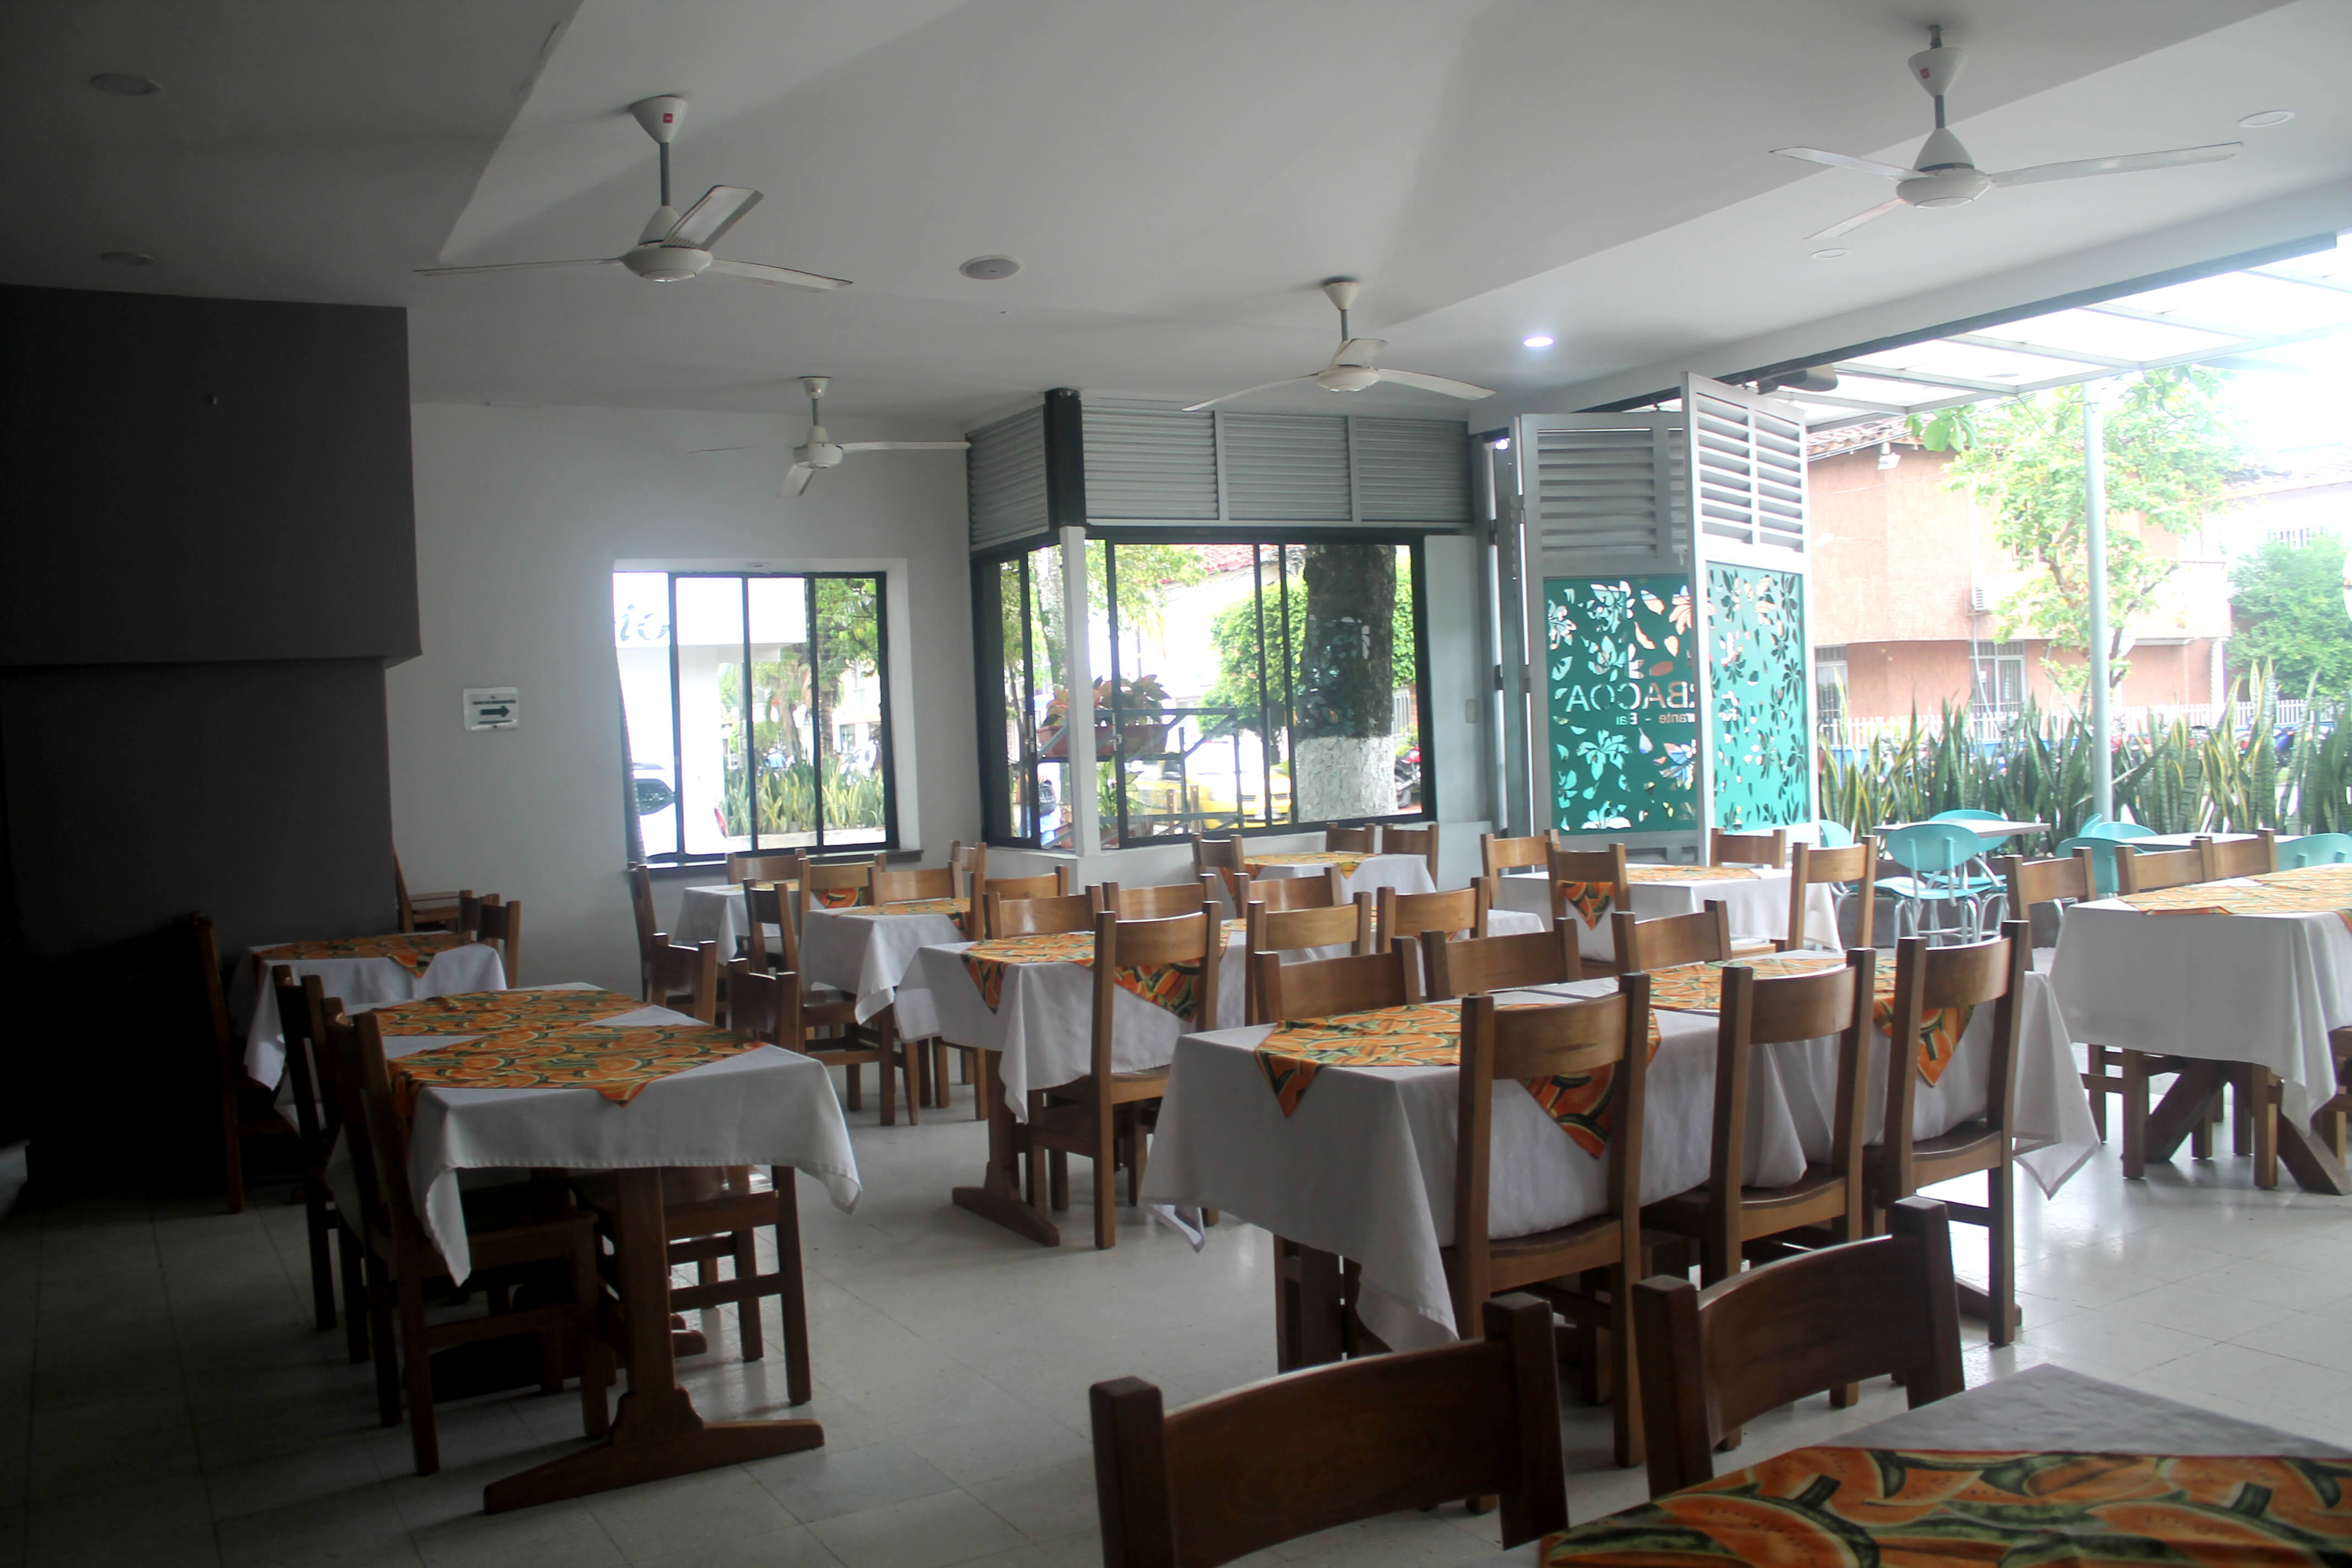 Restaurante Barbacoa de Apartadó